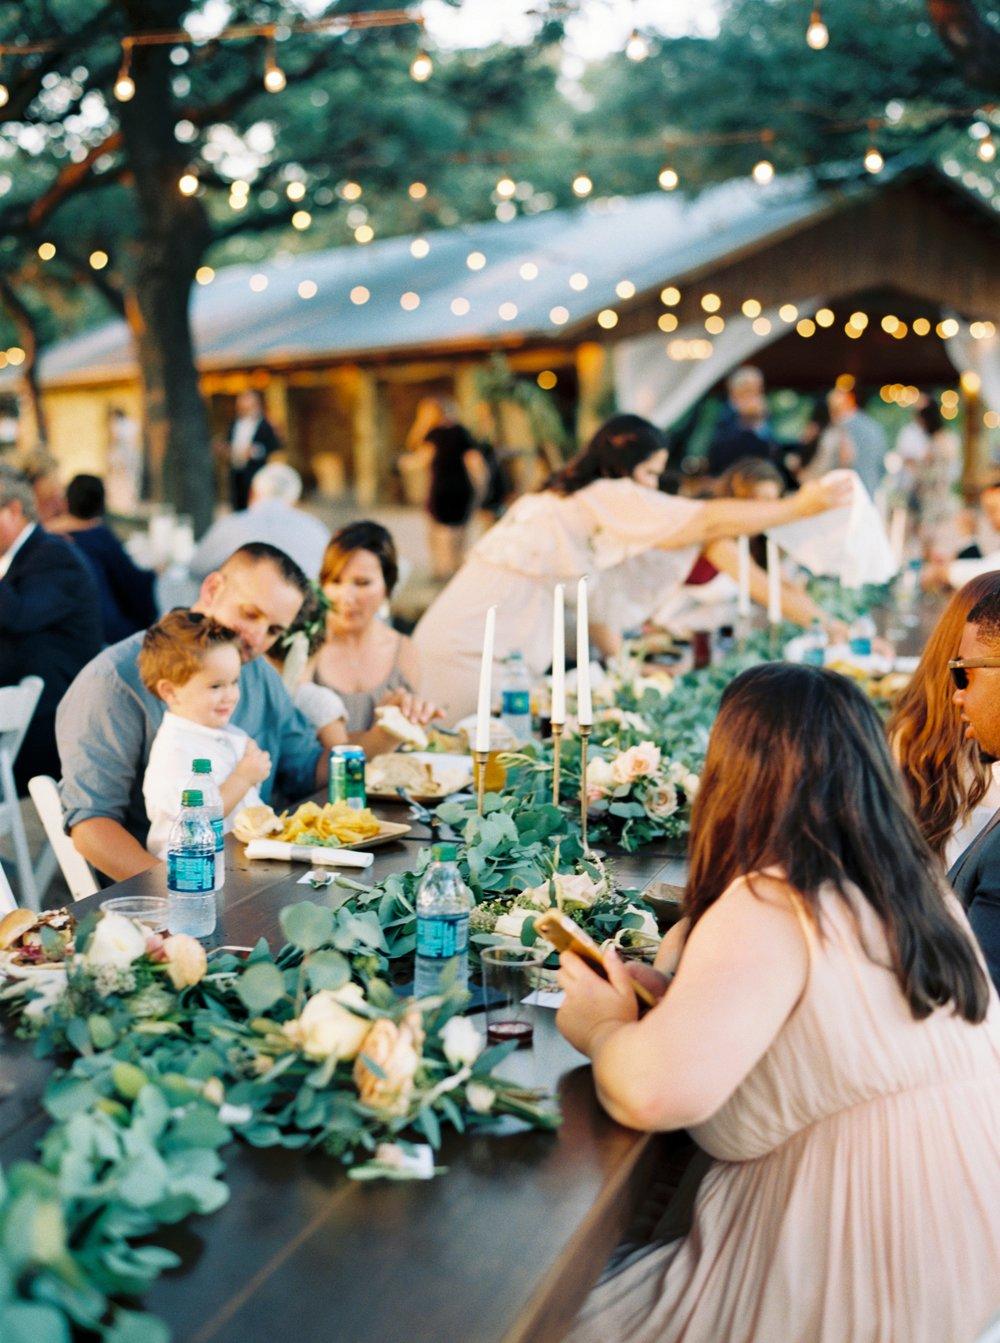 Florence Wedding Photographer, Telluride Wedding Photographer, New Orleans Wedding Photographer, Santa Barbara Wedding Photographer, Capri Wedding Photographer, Positano Wedding Photographer, Austin Luxury Wedding Photographer, Four Seasons Wedding, Woodlands Wedding Photographer,